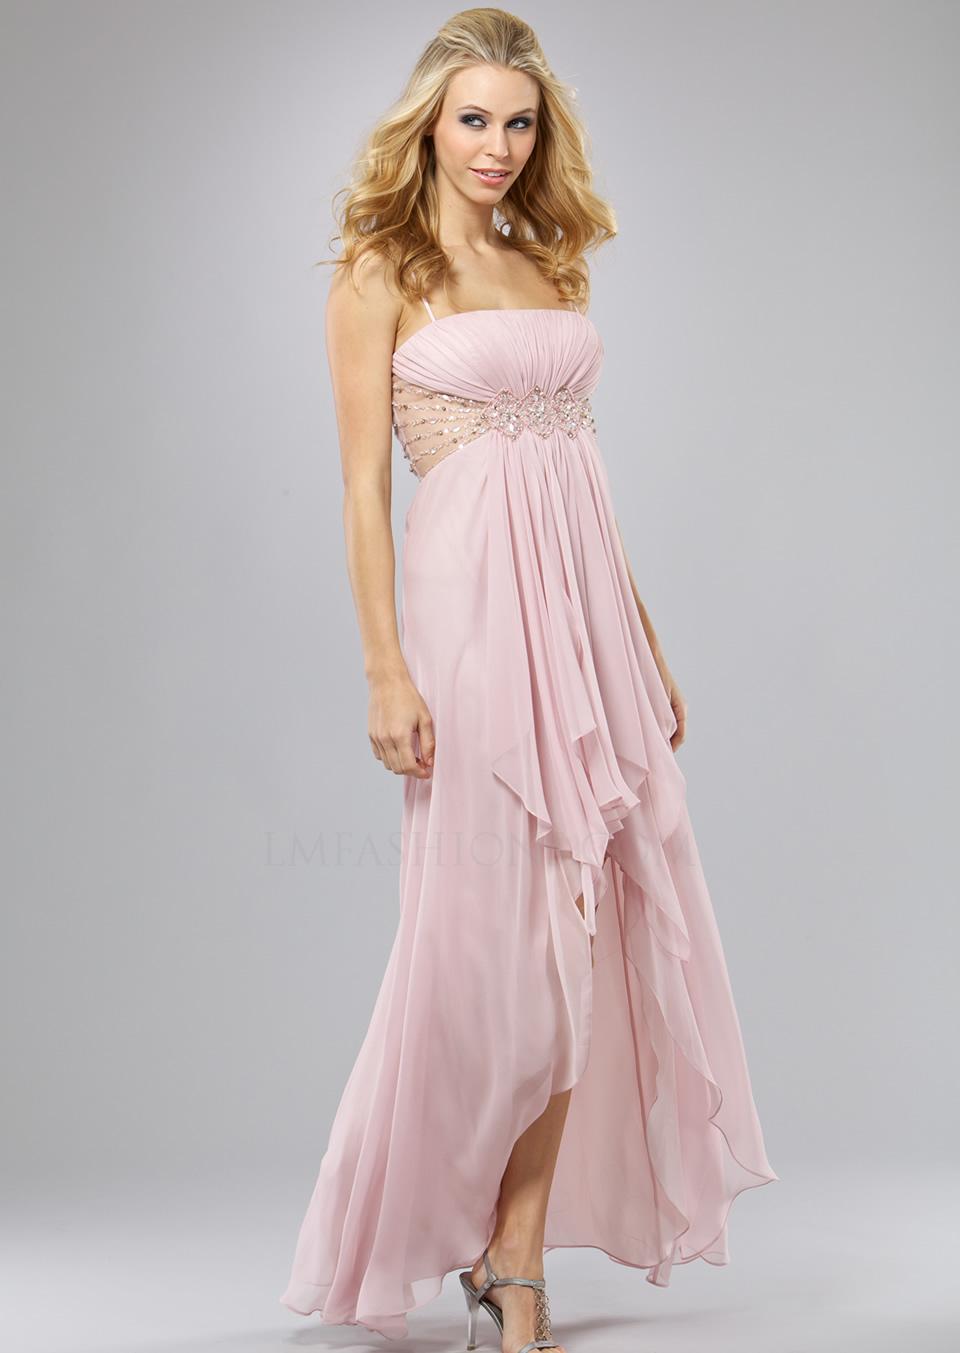 Women Beauty Tips 15 Gorgeous Pale Dresses for Women